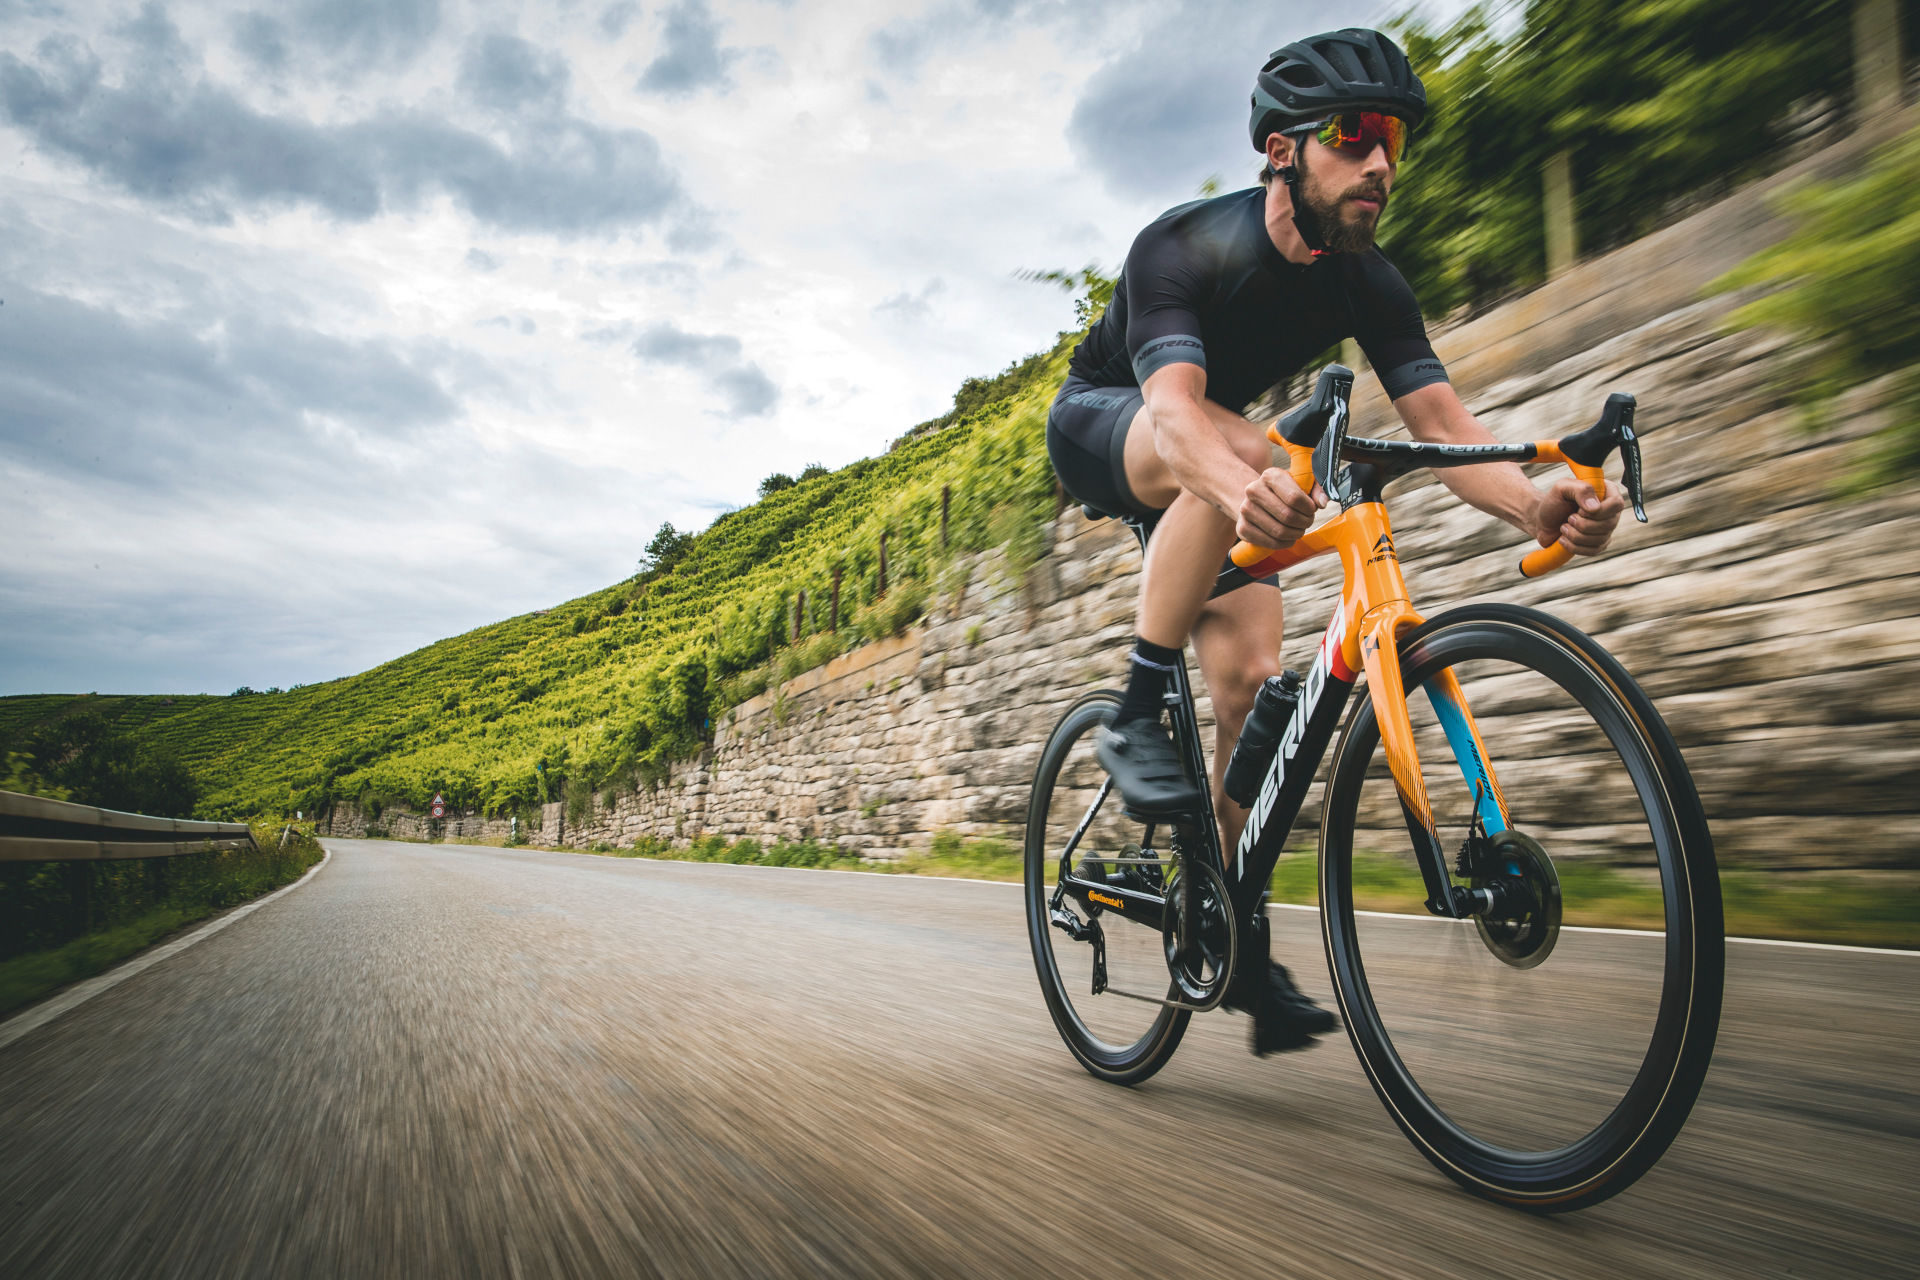 Merida 2021, rowery Merida 2021, rowery szosowe Merida, rowery górskie Merida, rowery górskie, rowery elektryczne Merida, rowery elektryczne, rowery dziecięce Merida, rowery dziecięce